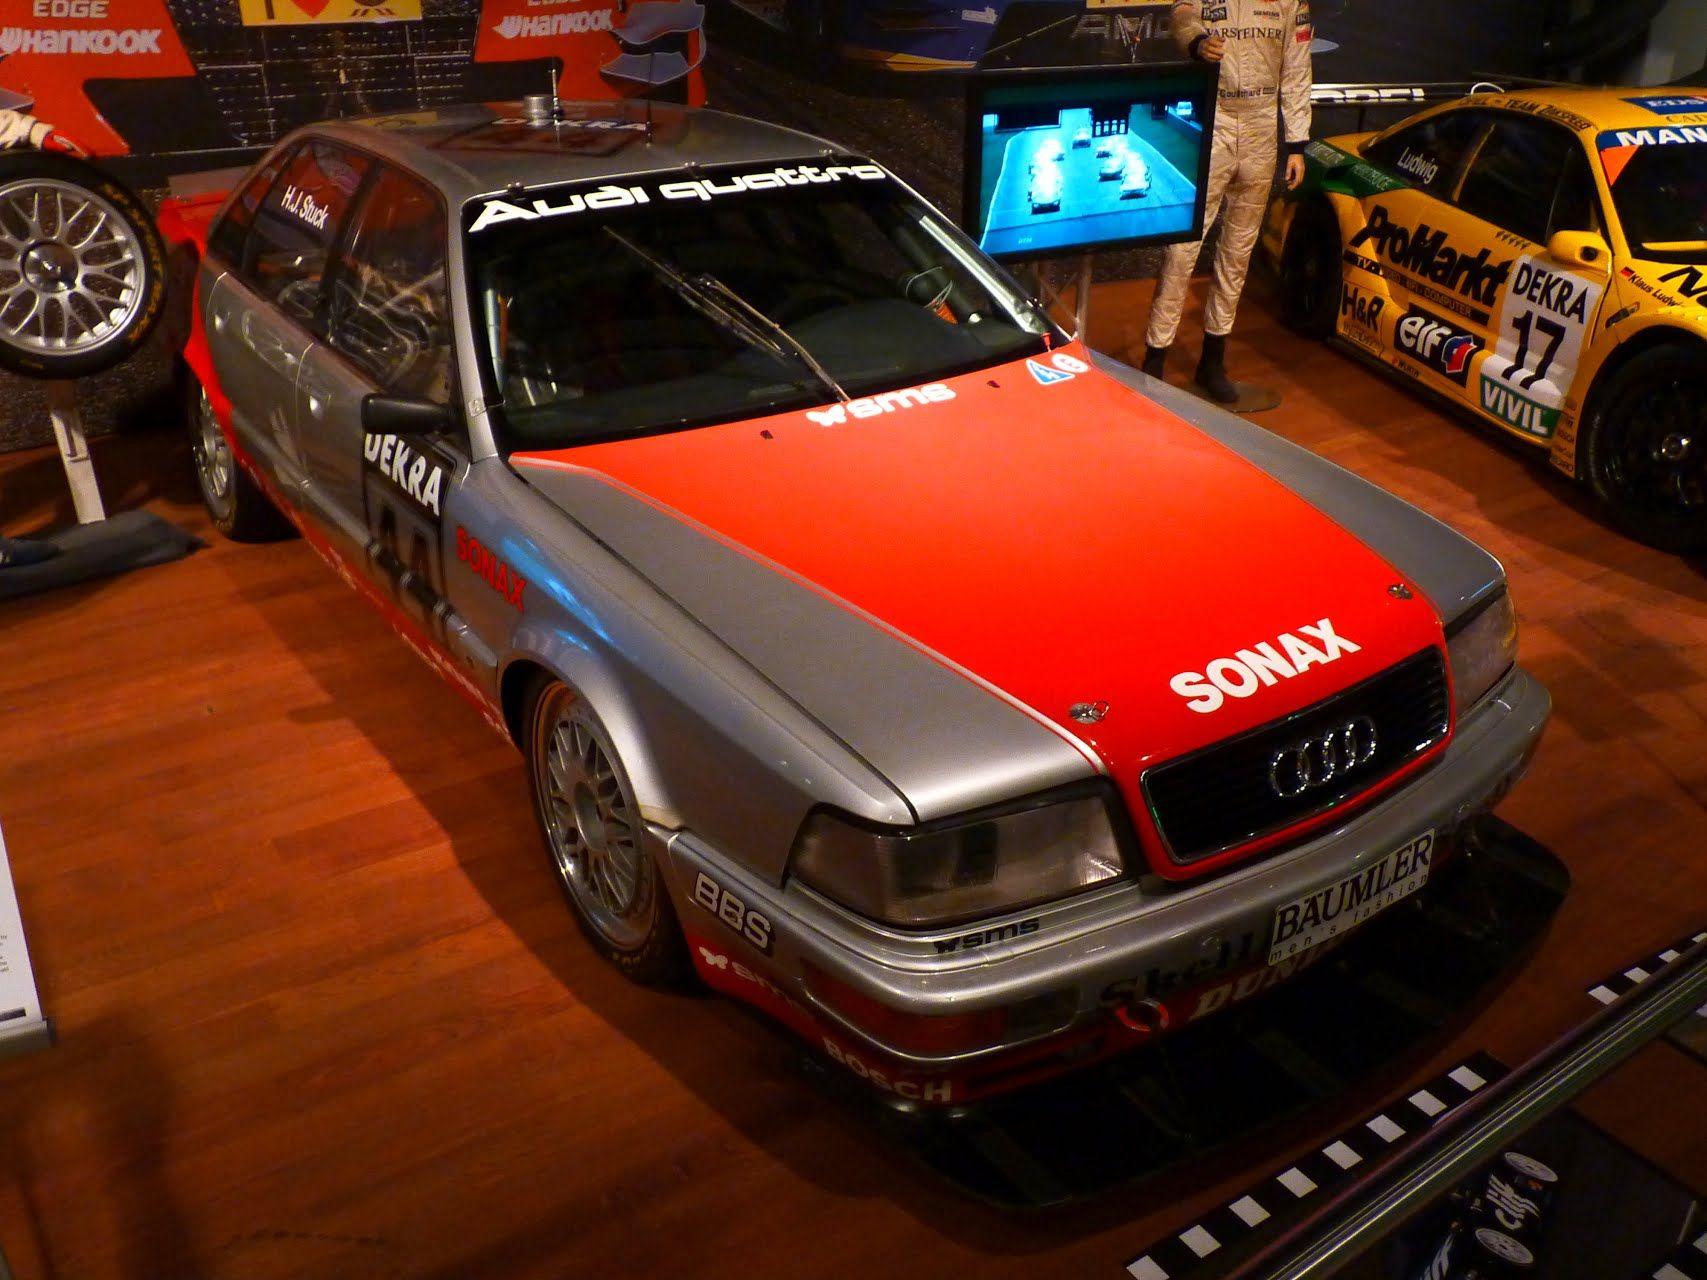 Audi V8 Quattro DTM 1992 Audi, Hot cars, Car wheels